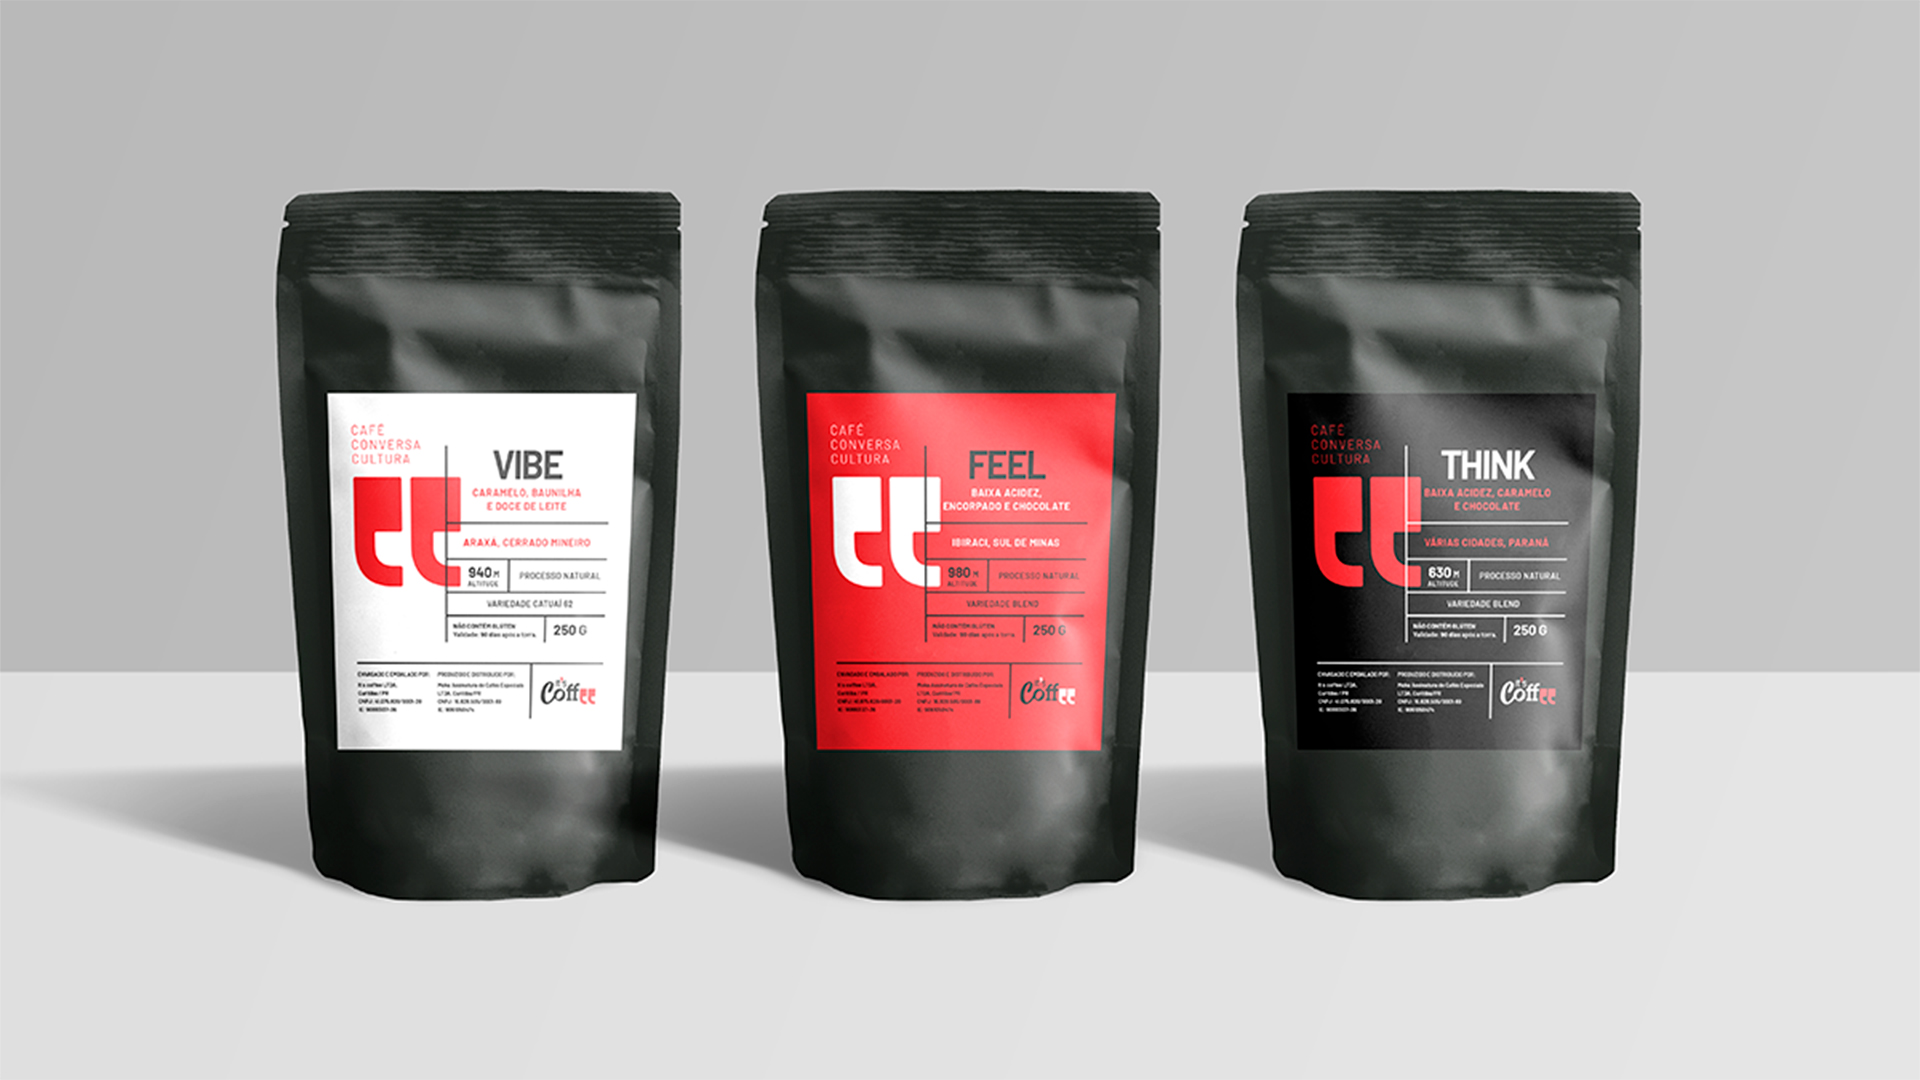 Identidade visual da It's Coffee desenvolvida pela Doma Design